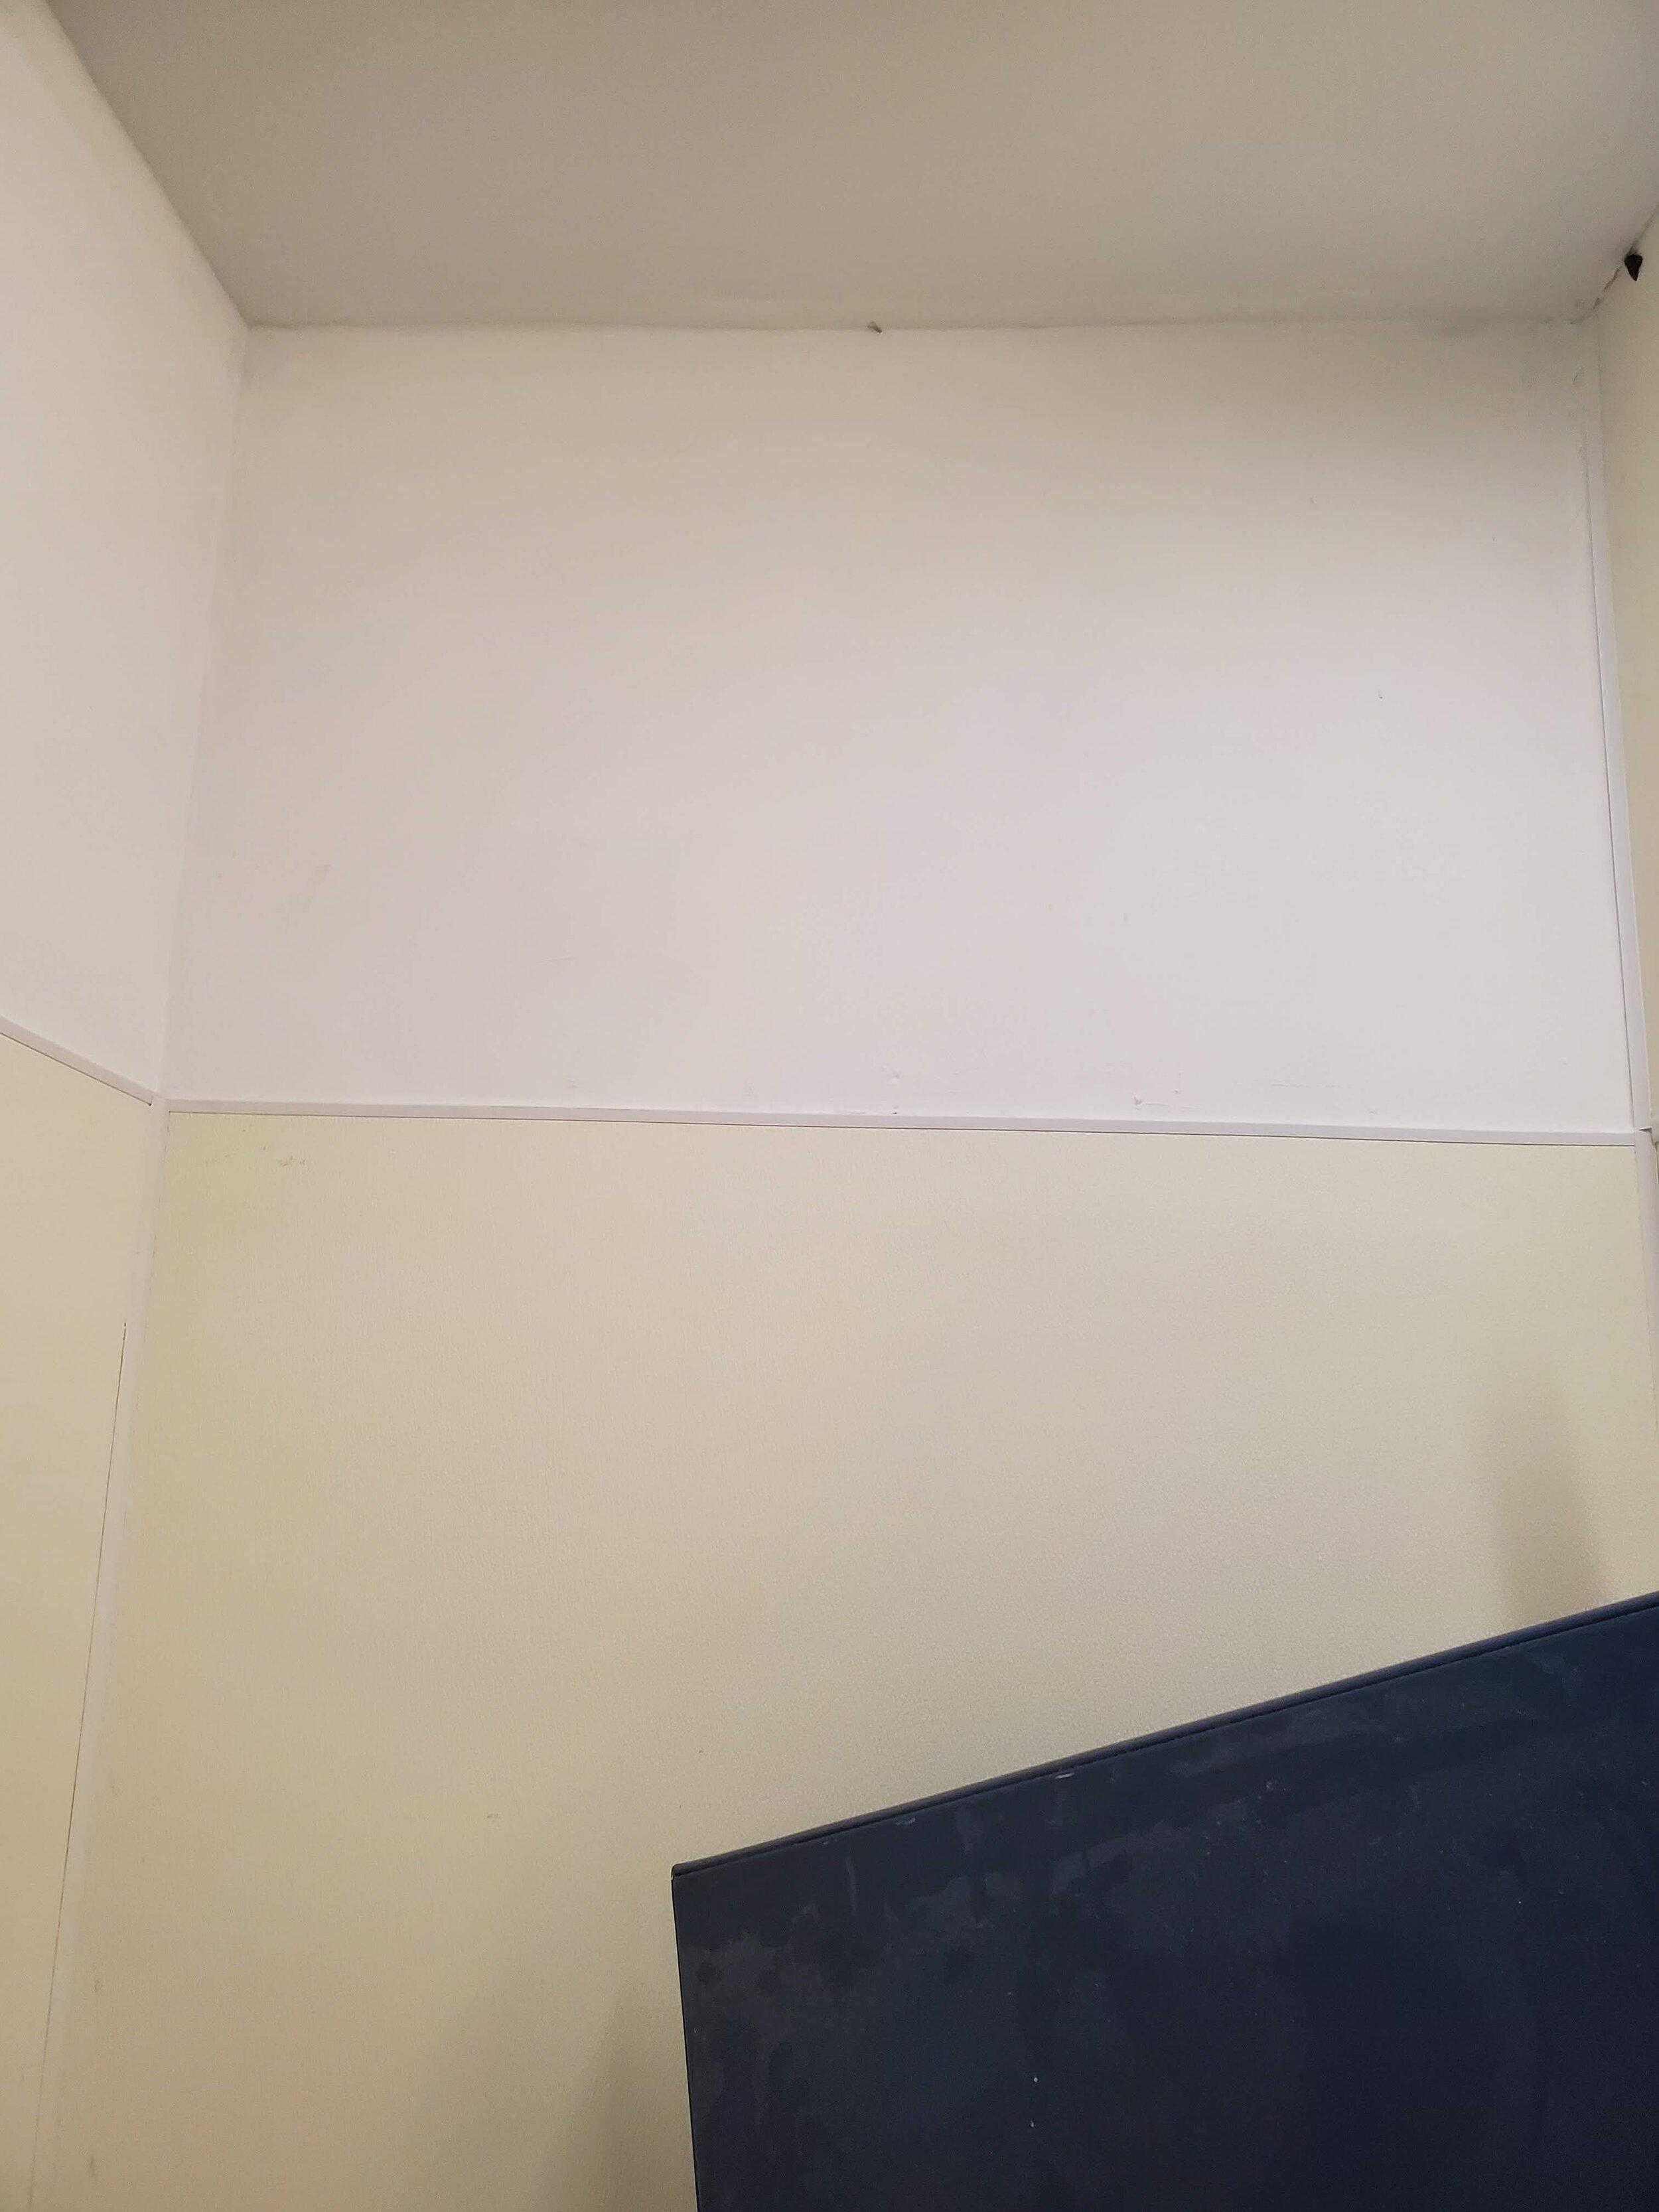 2019 First Floor Bathroom Renovation 20190903_112916.jpg